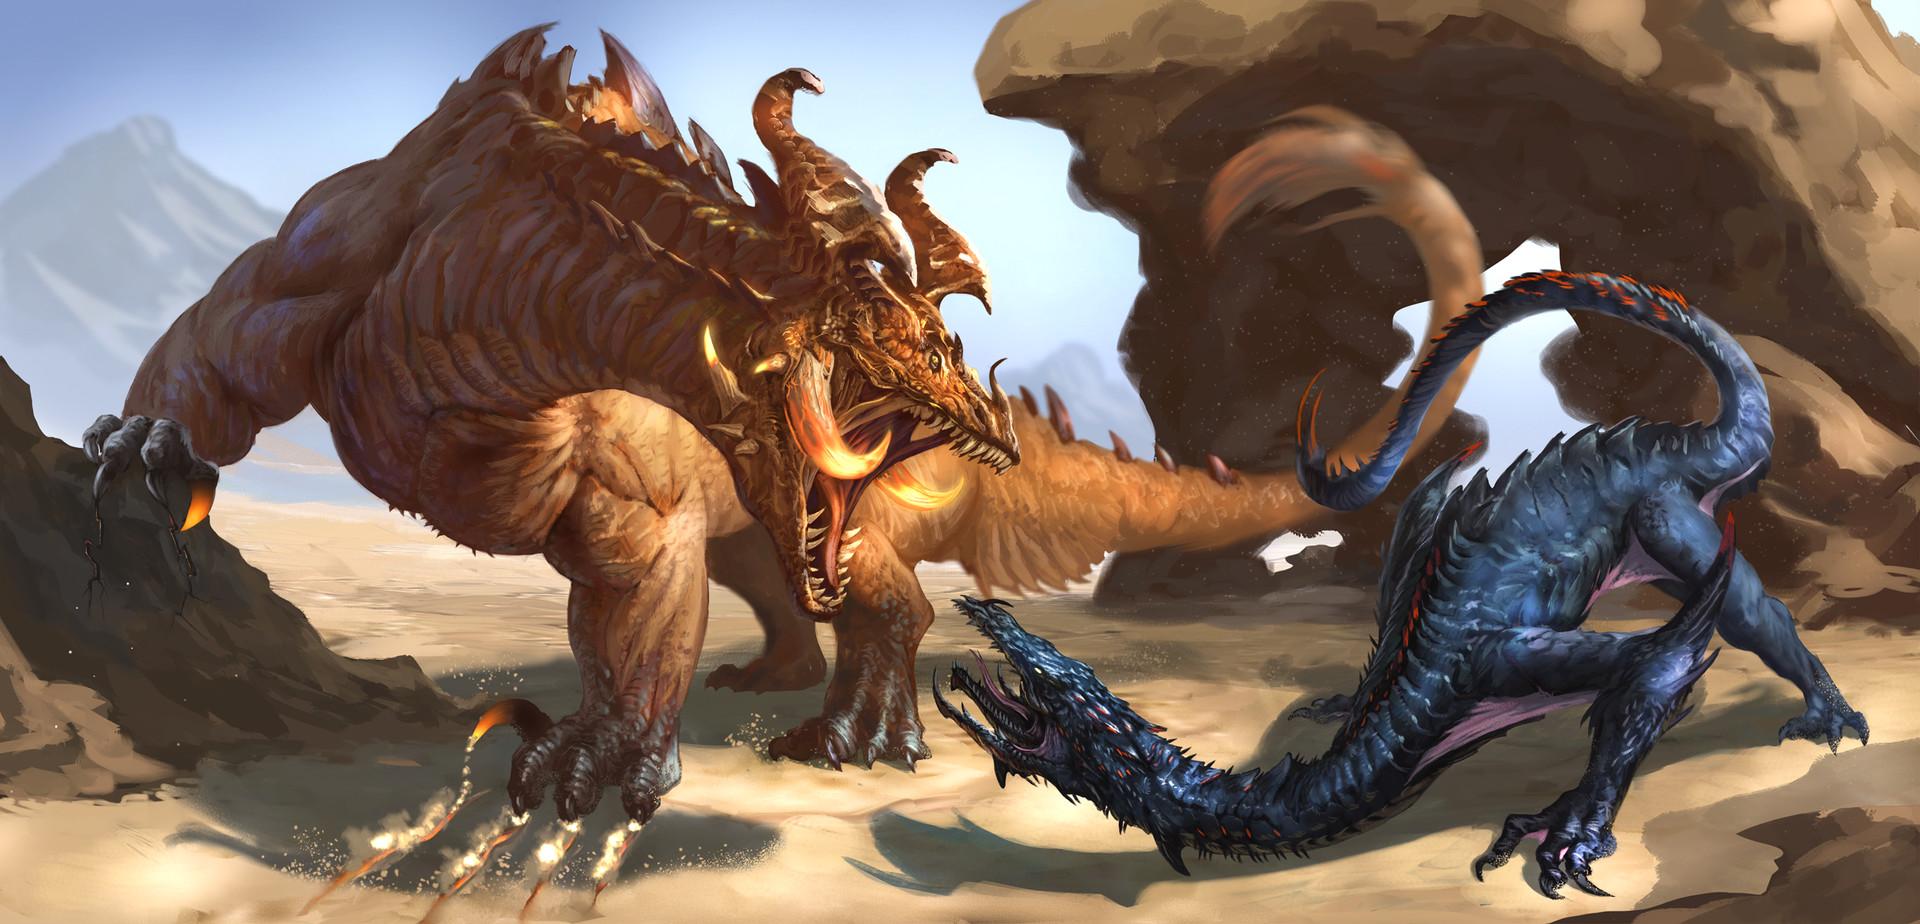 Earth Dragon: Earth Dragon Versus Deathstalker By Dave Melvin